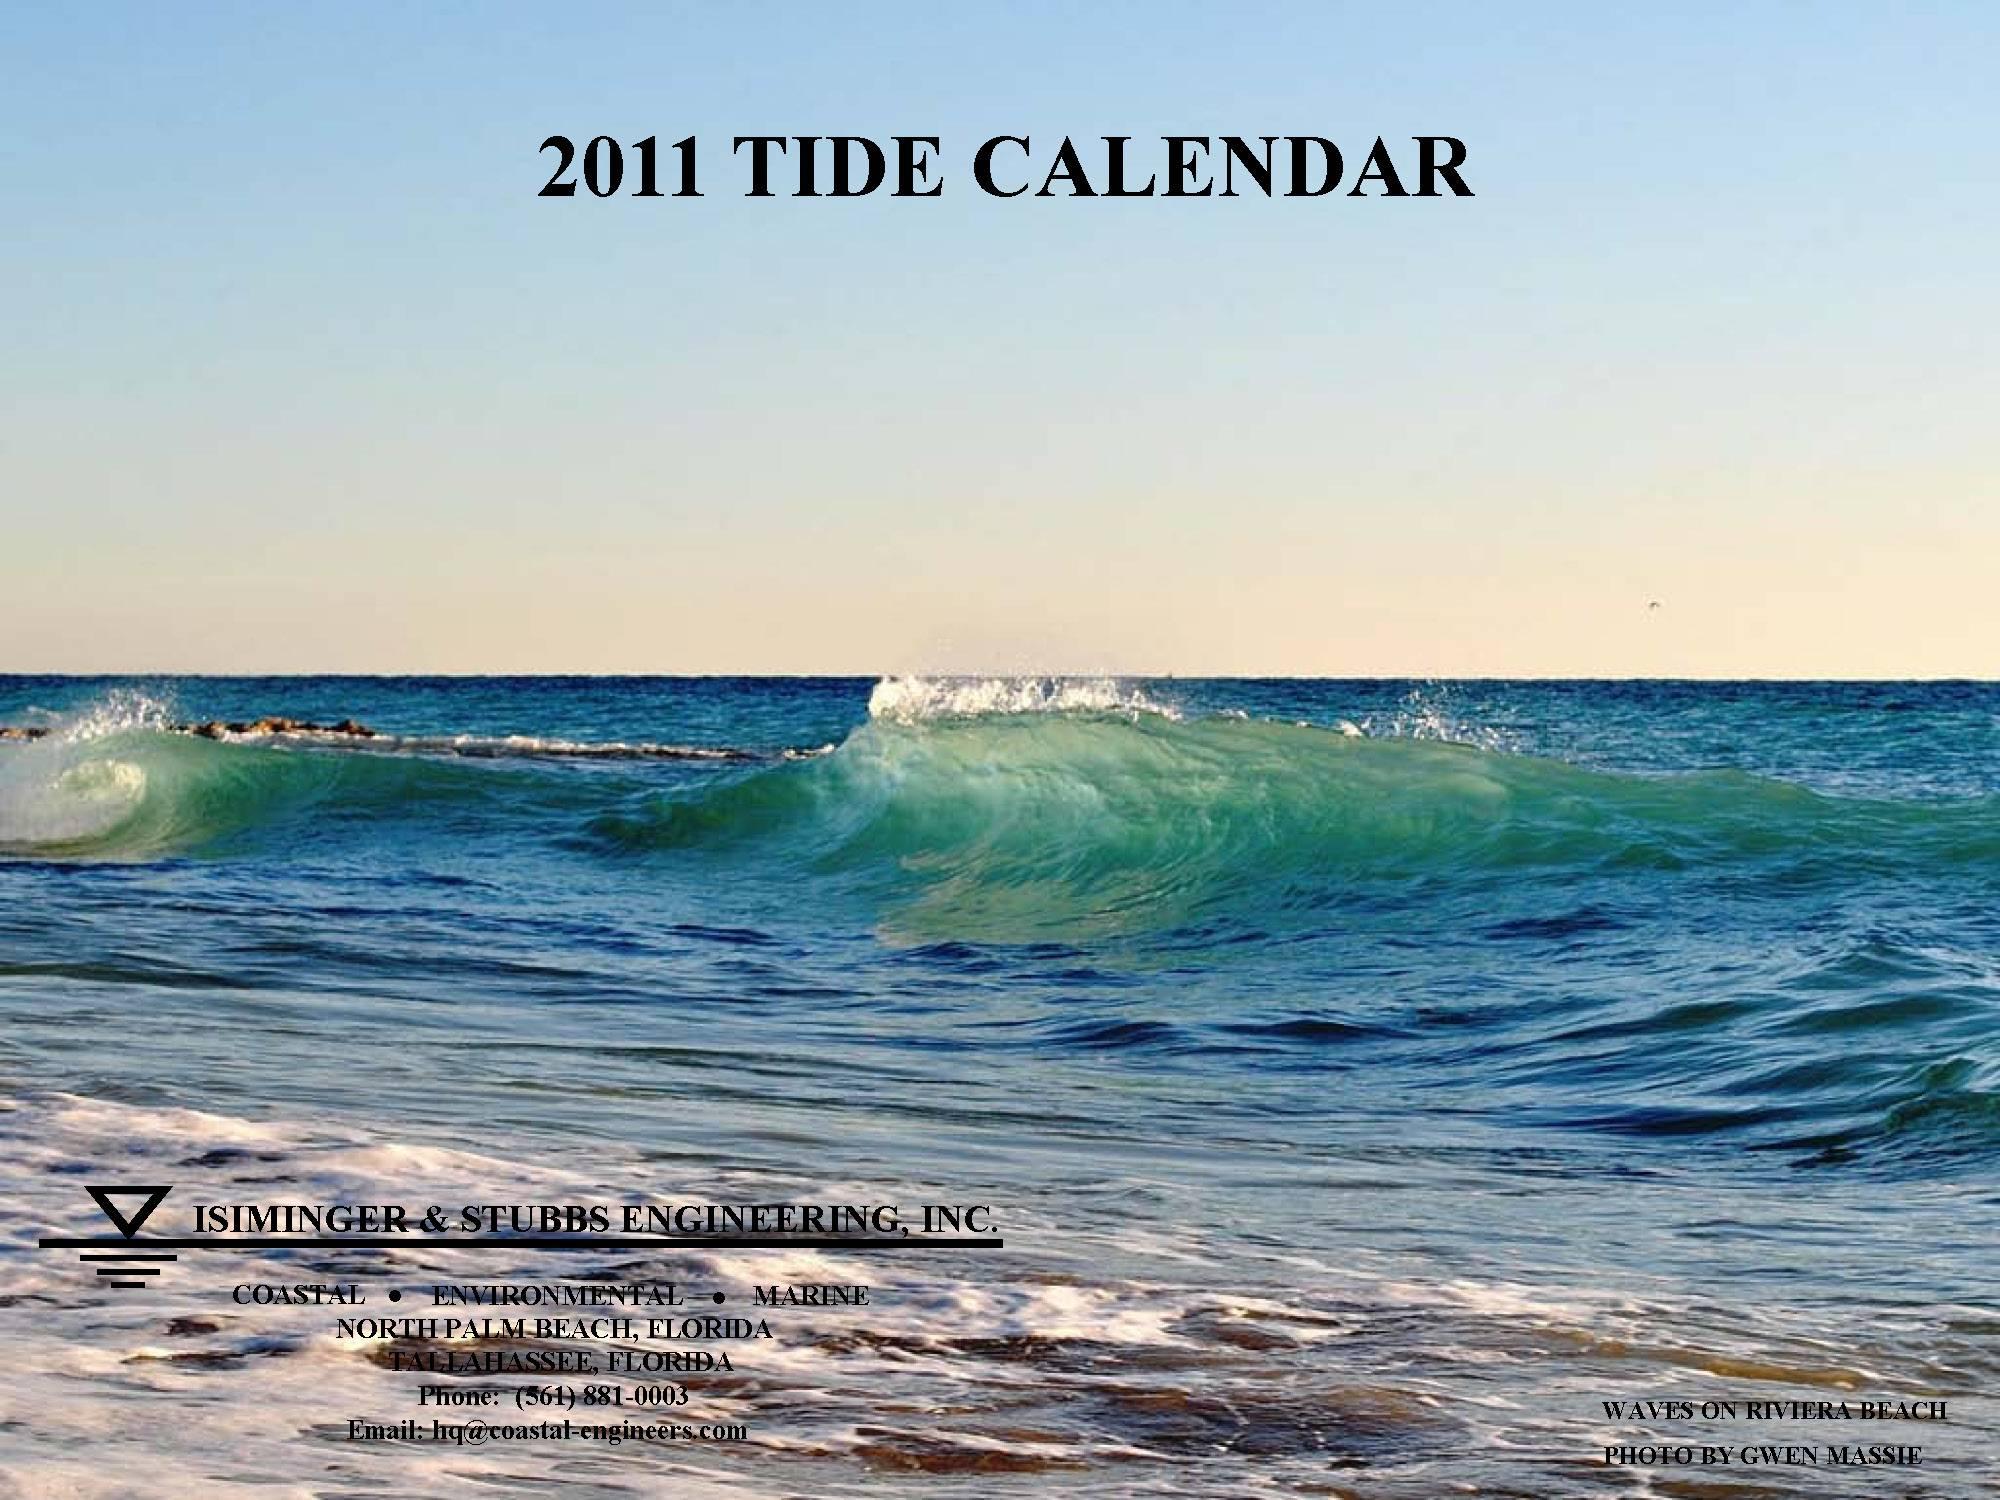 2011 Tide Calendar Cover